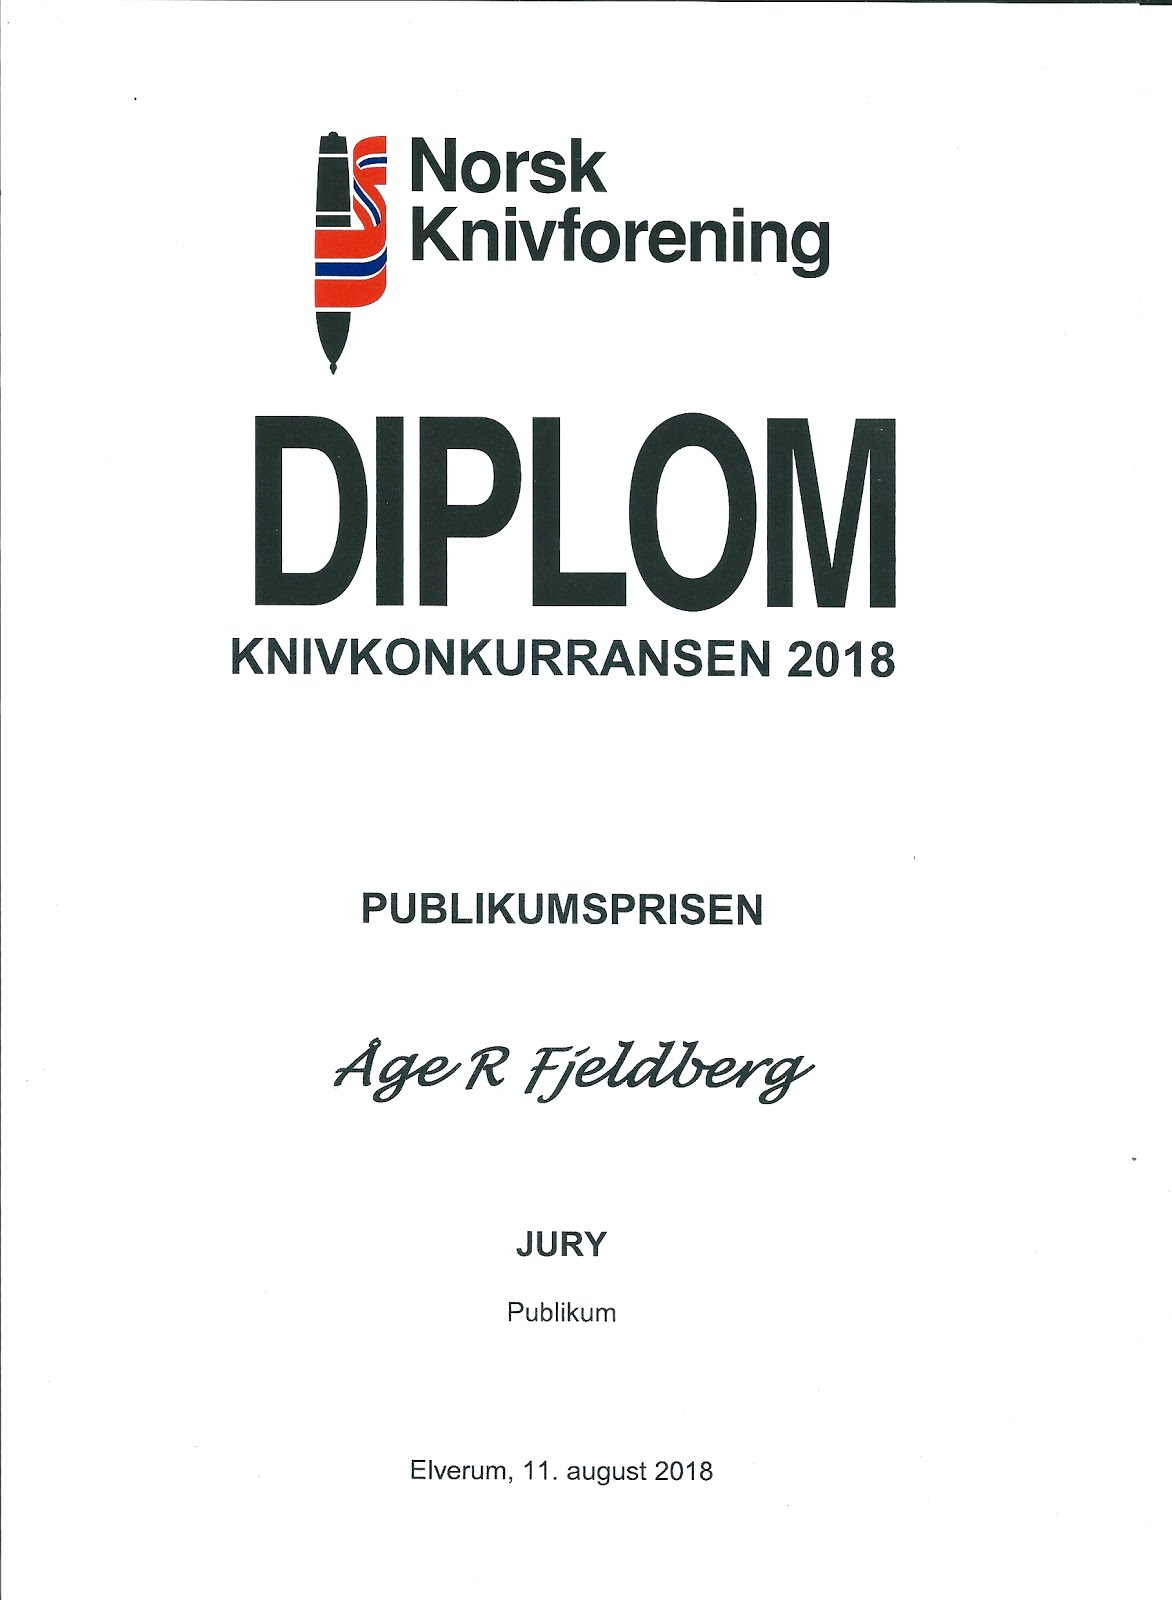 Elverum 2018 Norsk Knivforening